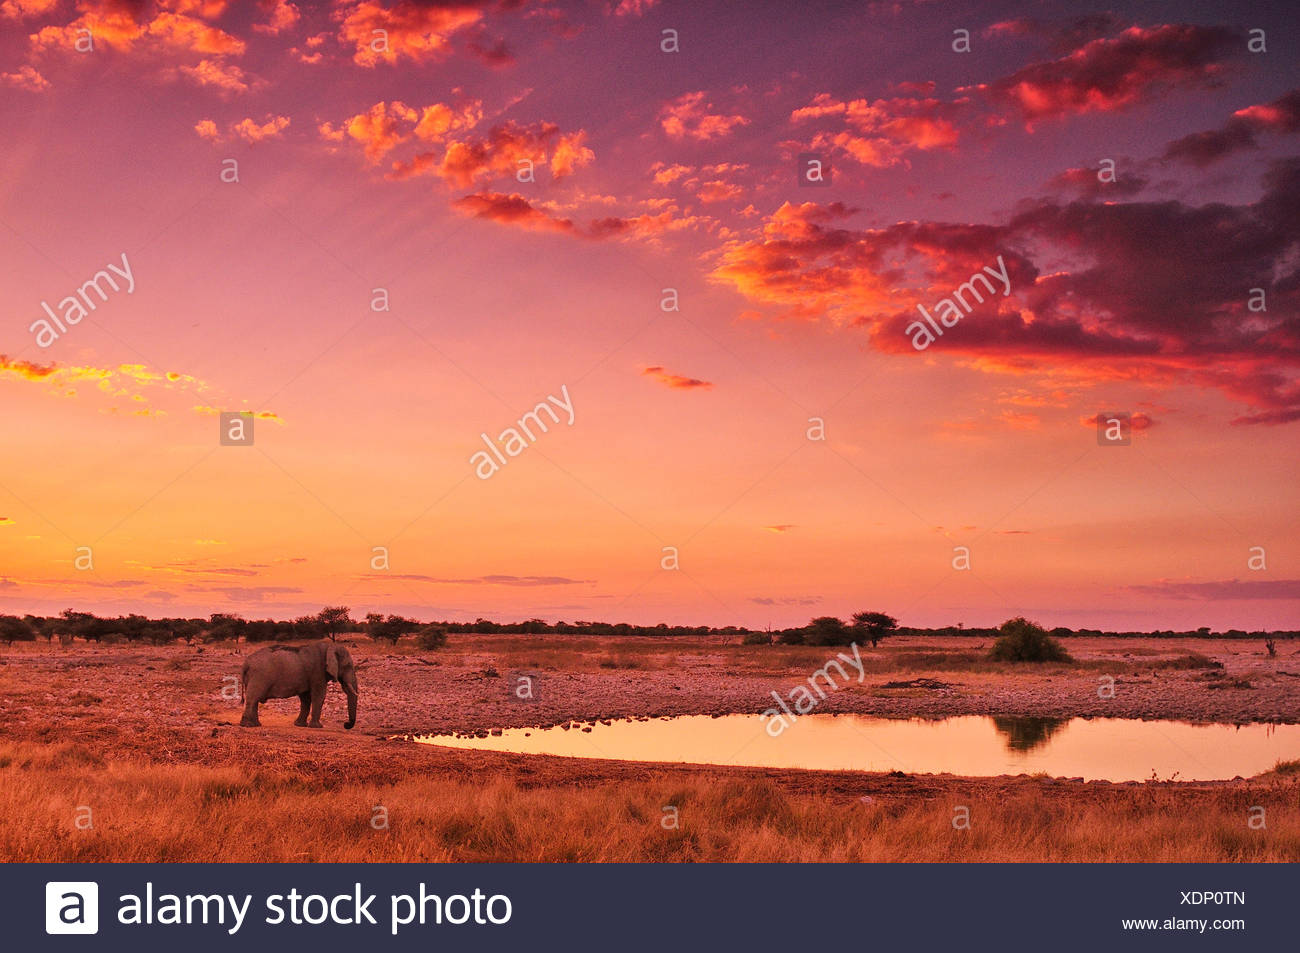 Africa, Namibia, Etosha National Park, tramonto, elefante, animale, waterhole, safari, animali selvatici, rosso, Loxodonta africana, una Foto Stock